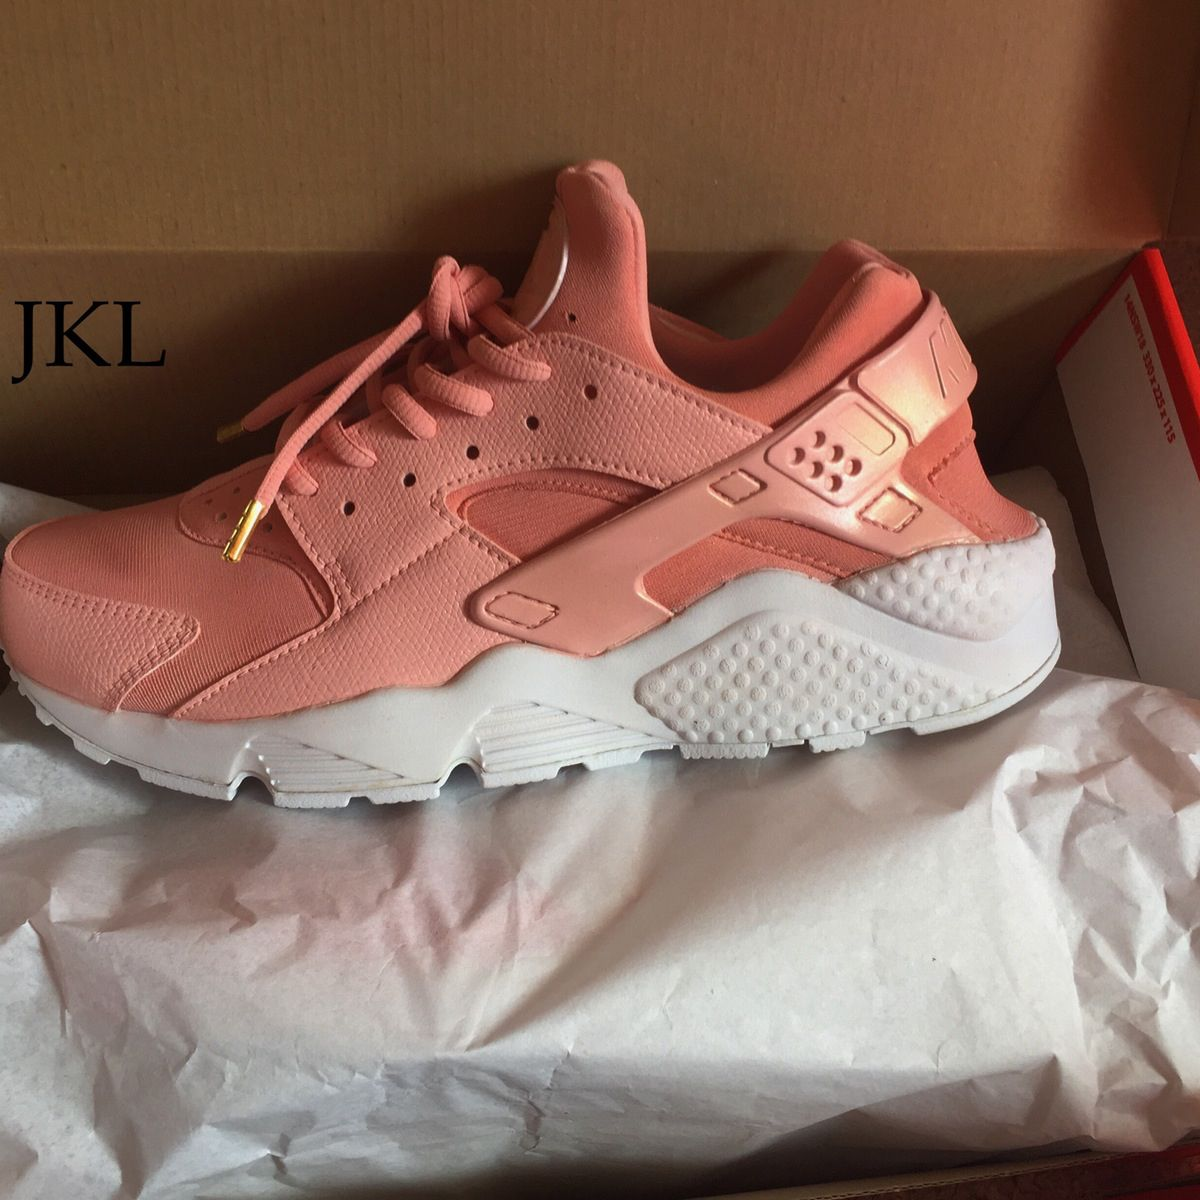 nike chaussure femme huarache rose gold